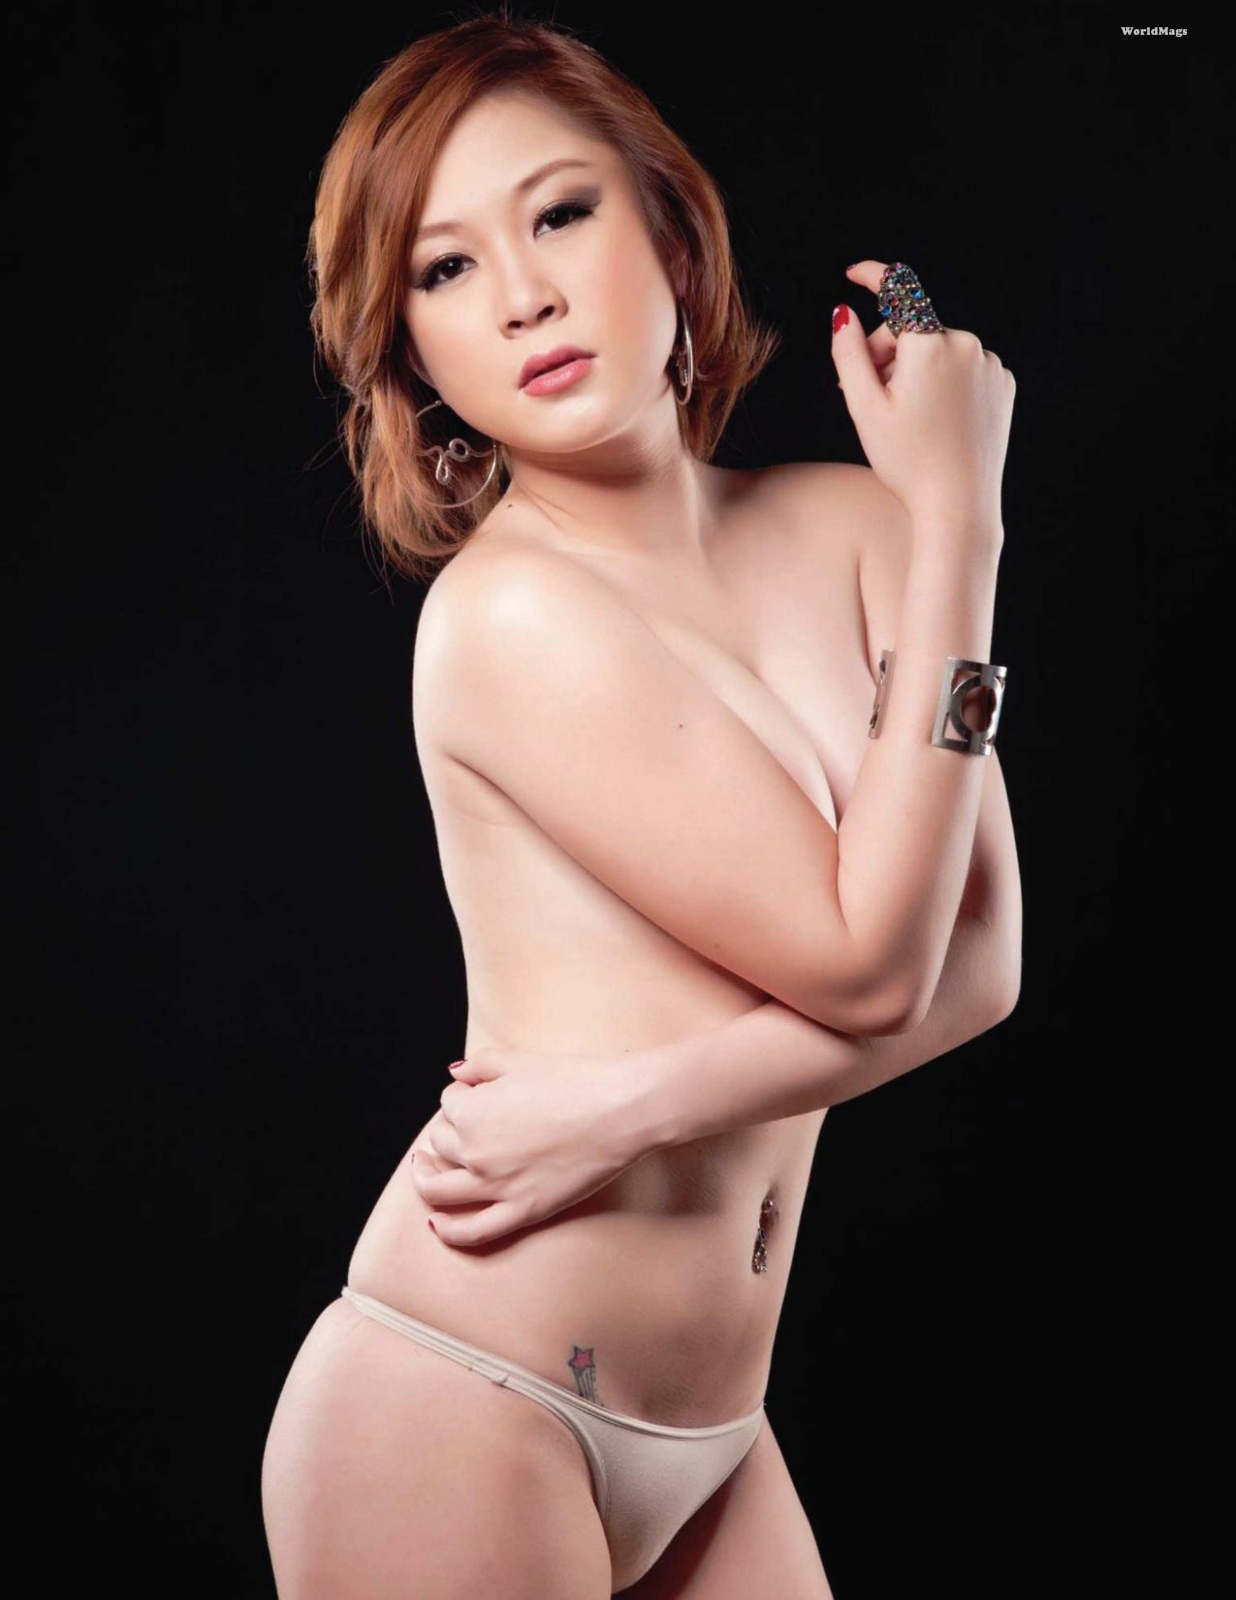 sexy asian girls nude pics 08